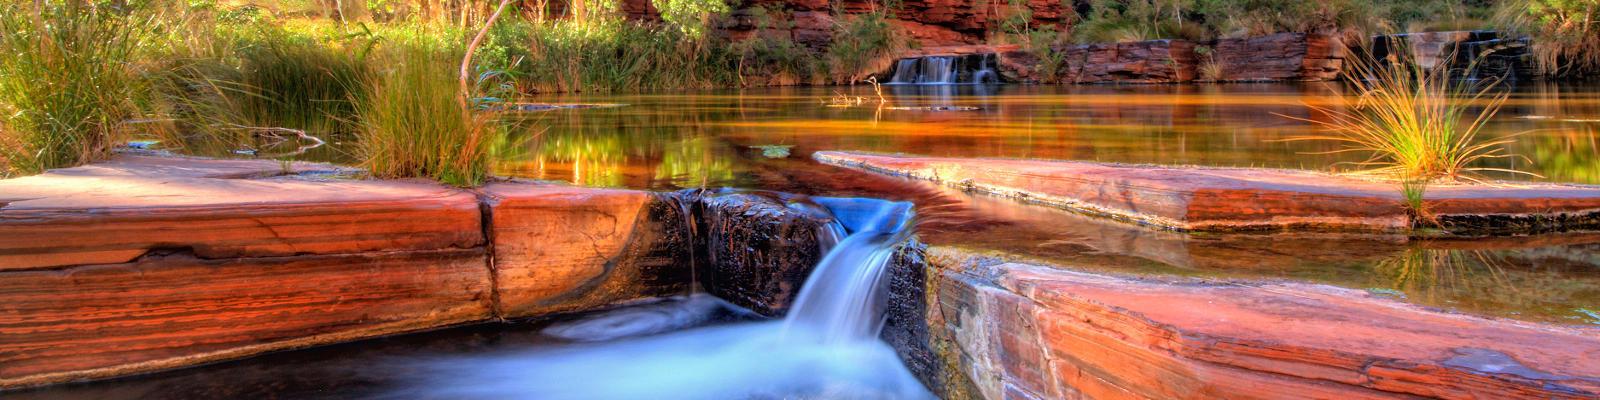 western australia nature